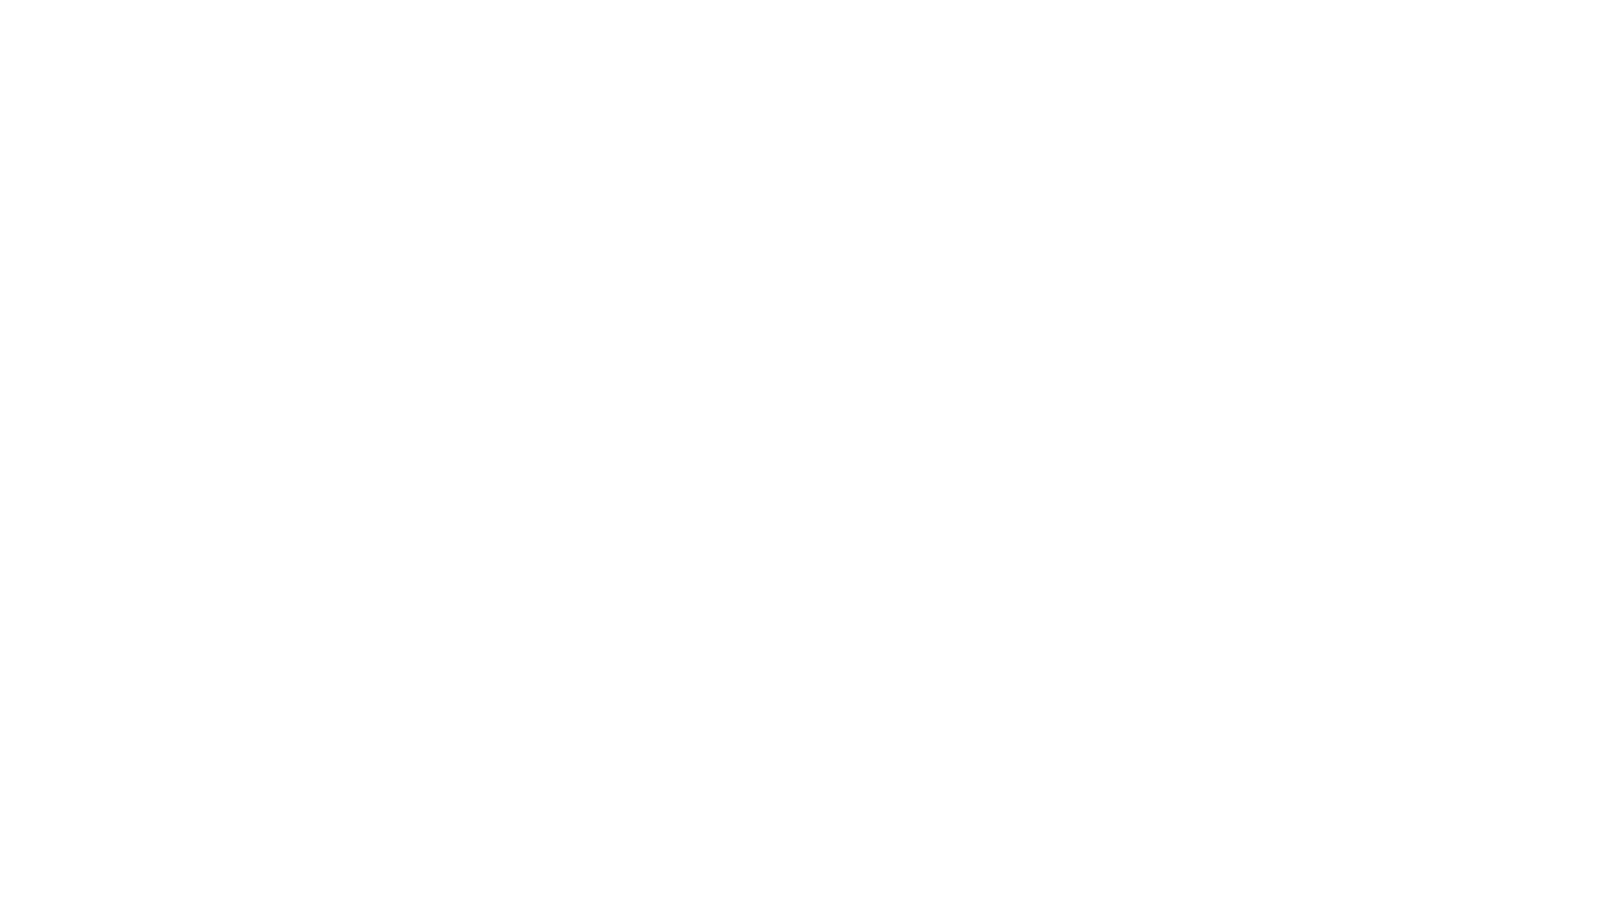 A PLUS MÜHENDİSLİK OTOGAZ DÖNÜŞÜM SİSTEMLERİ.  WHATSAPP: 05061580060 WEB SİTESİ: http://www.aplusotogaz.com/ MAİL:info@aplusotogaz.com ADRES: Bostancı San. Sitesi A blok Zambak Sk. No:12 Bostancı/Kadıköy  #kia #sportage #lpg #video #android